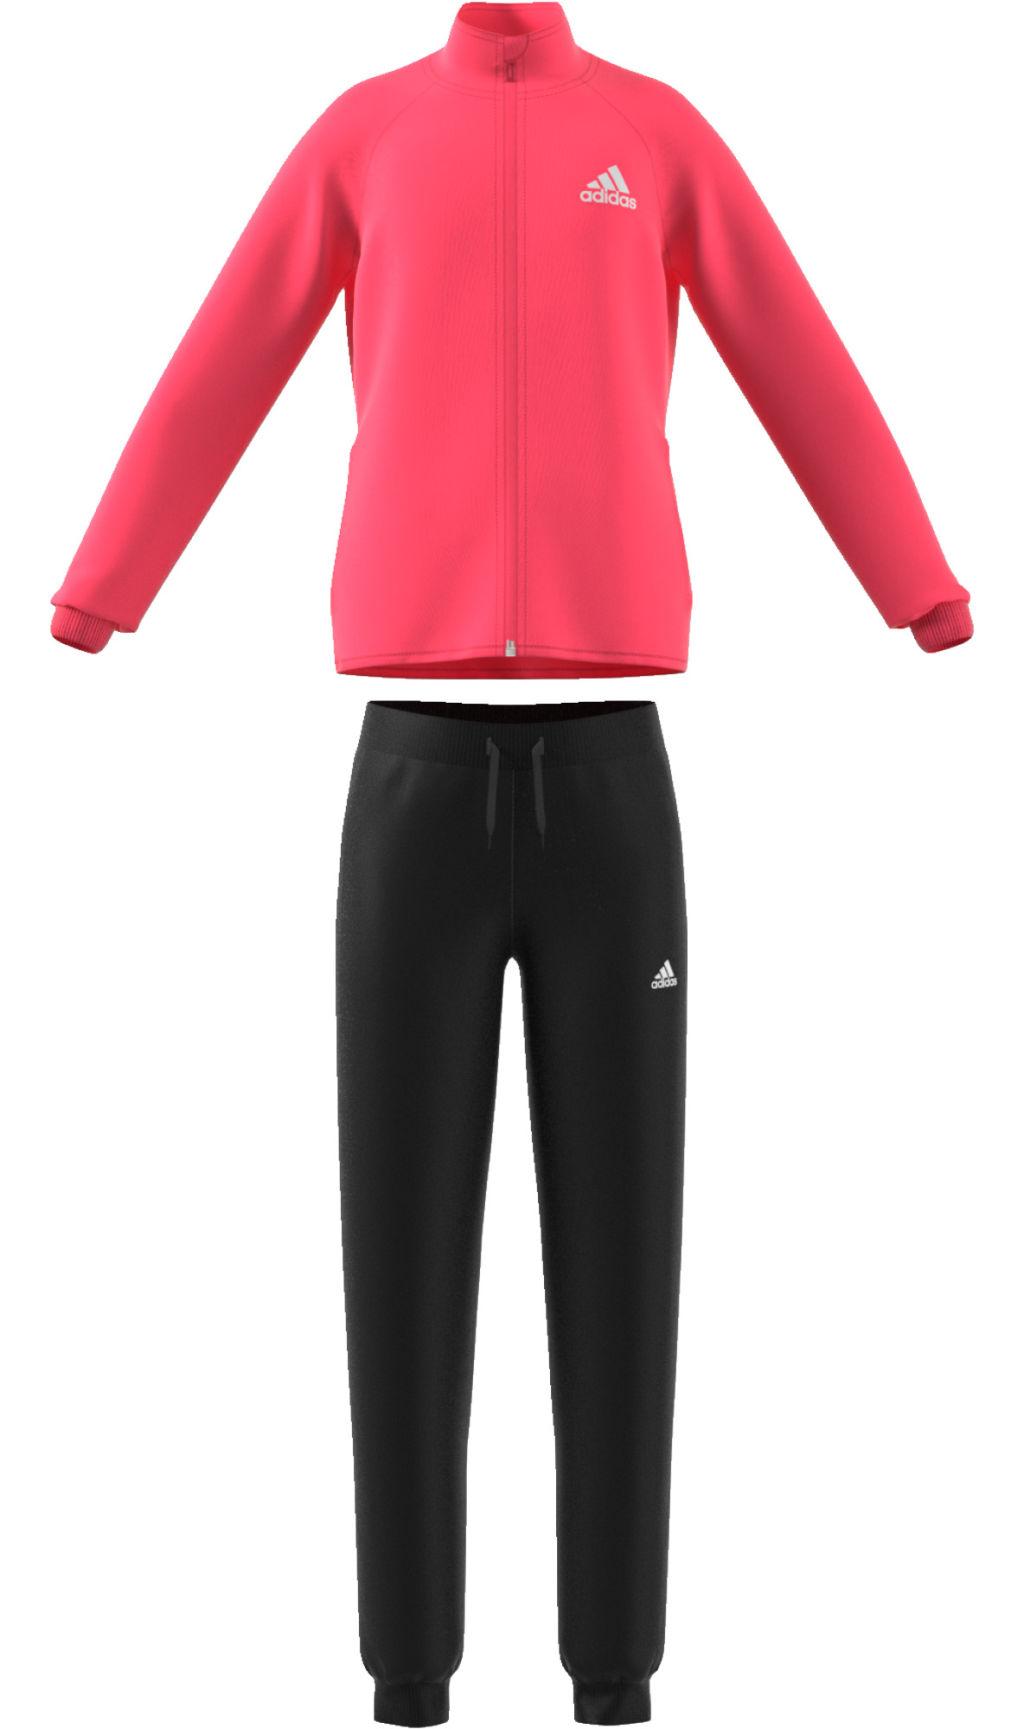 Adidas Yg S Entry Ts tyttöjen verryttelyasu Pinkki e351e82b75